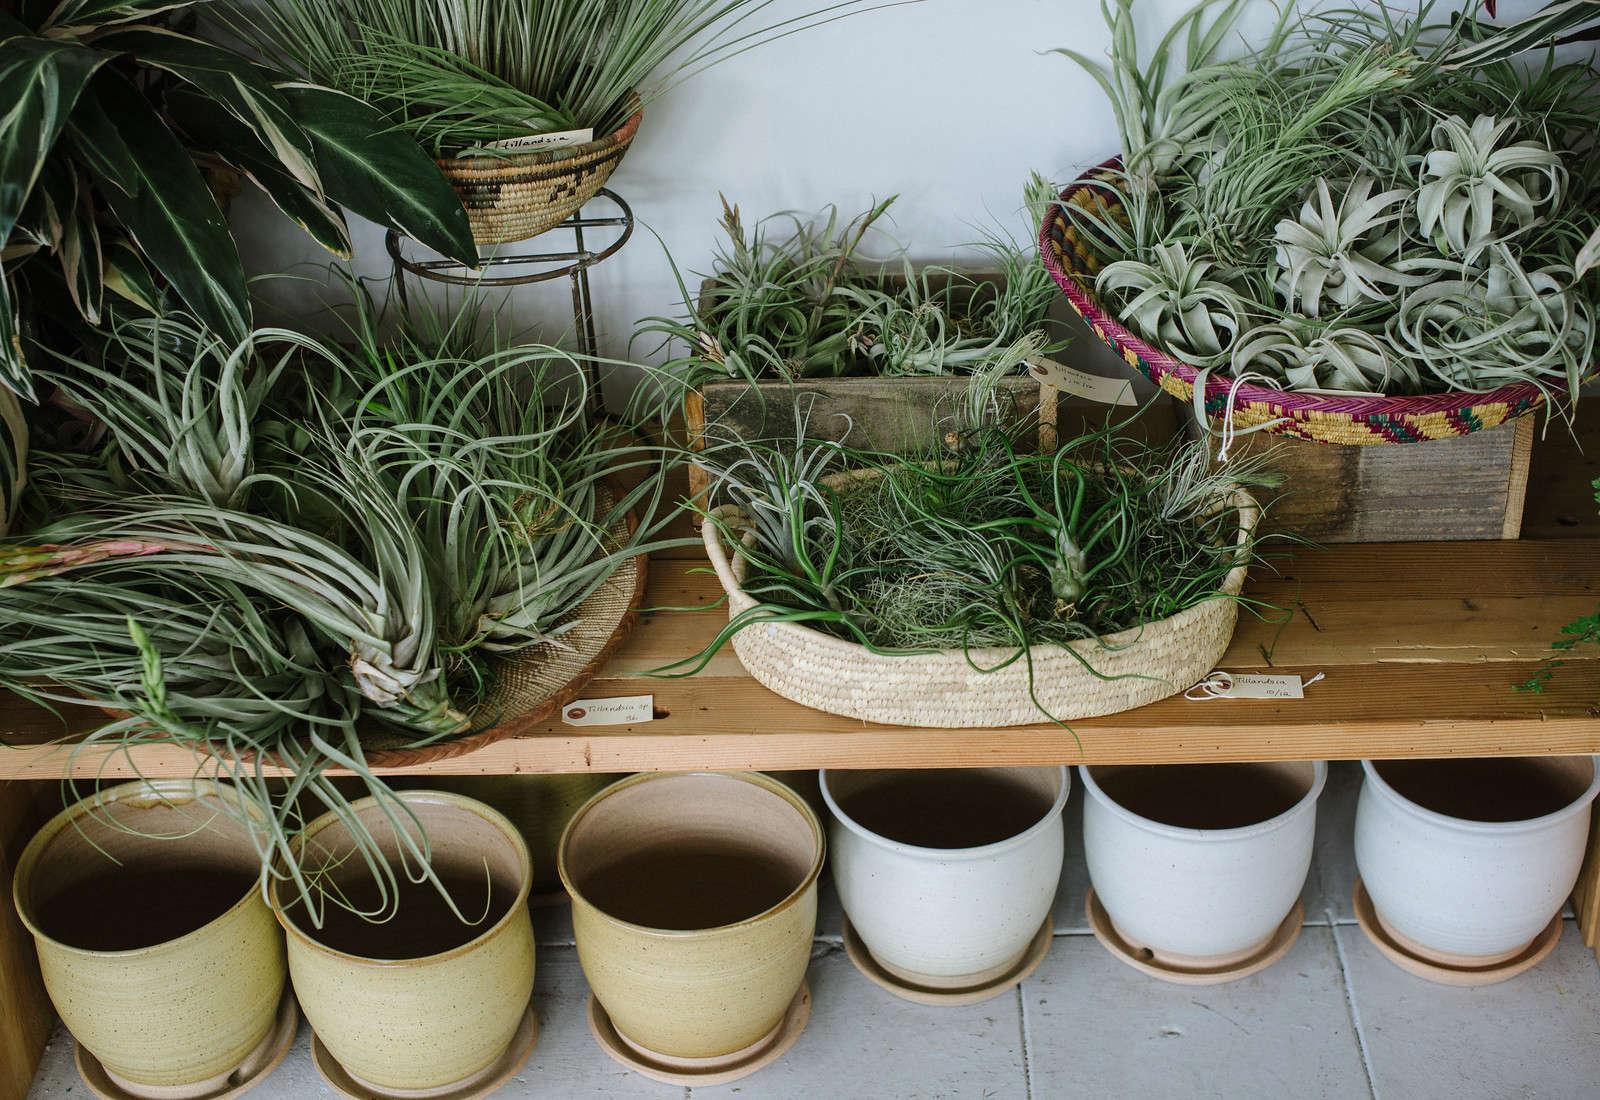 solabee_airplants_gardenista